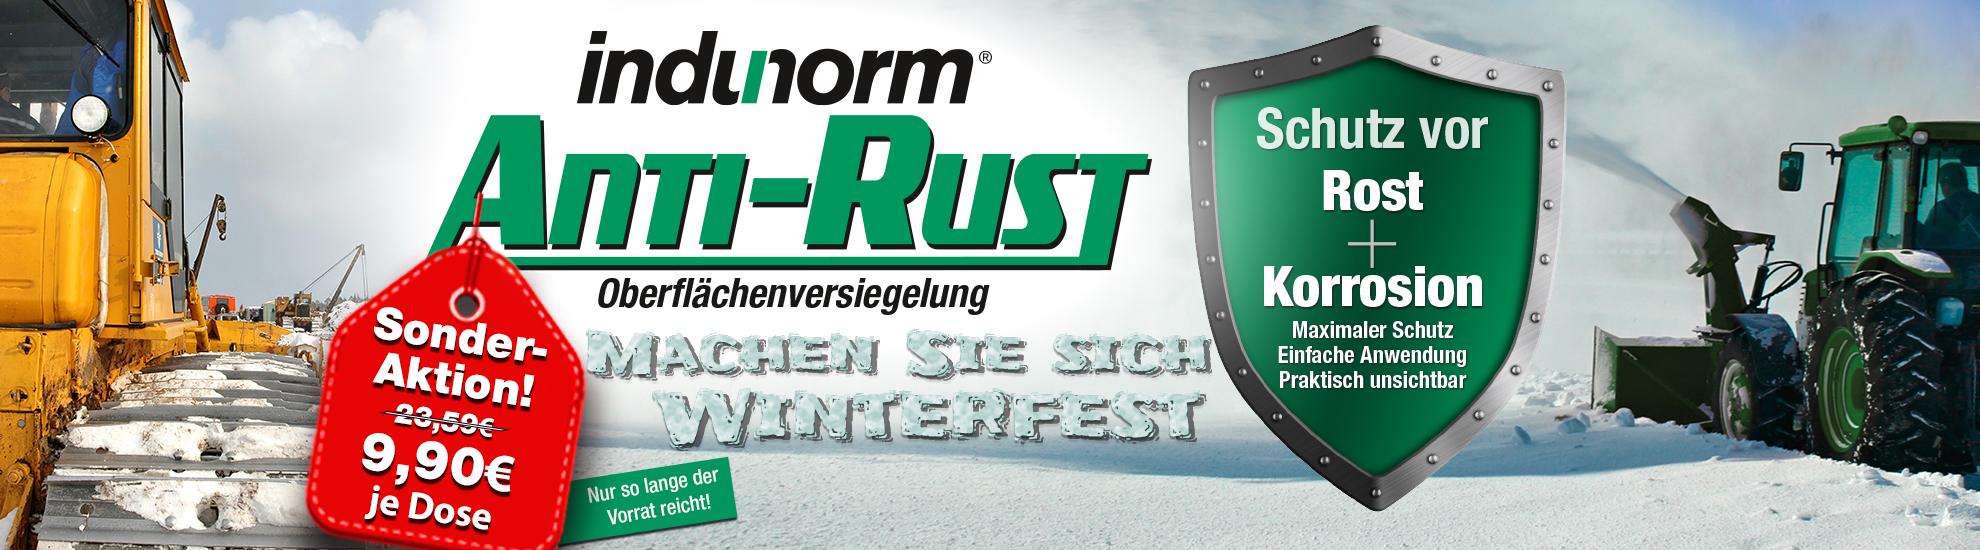 Indunorm Anti-Rust Aktion